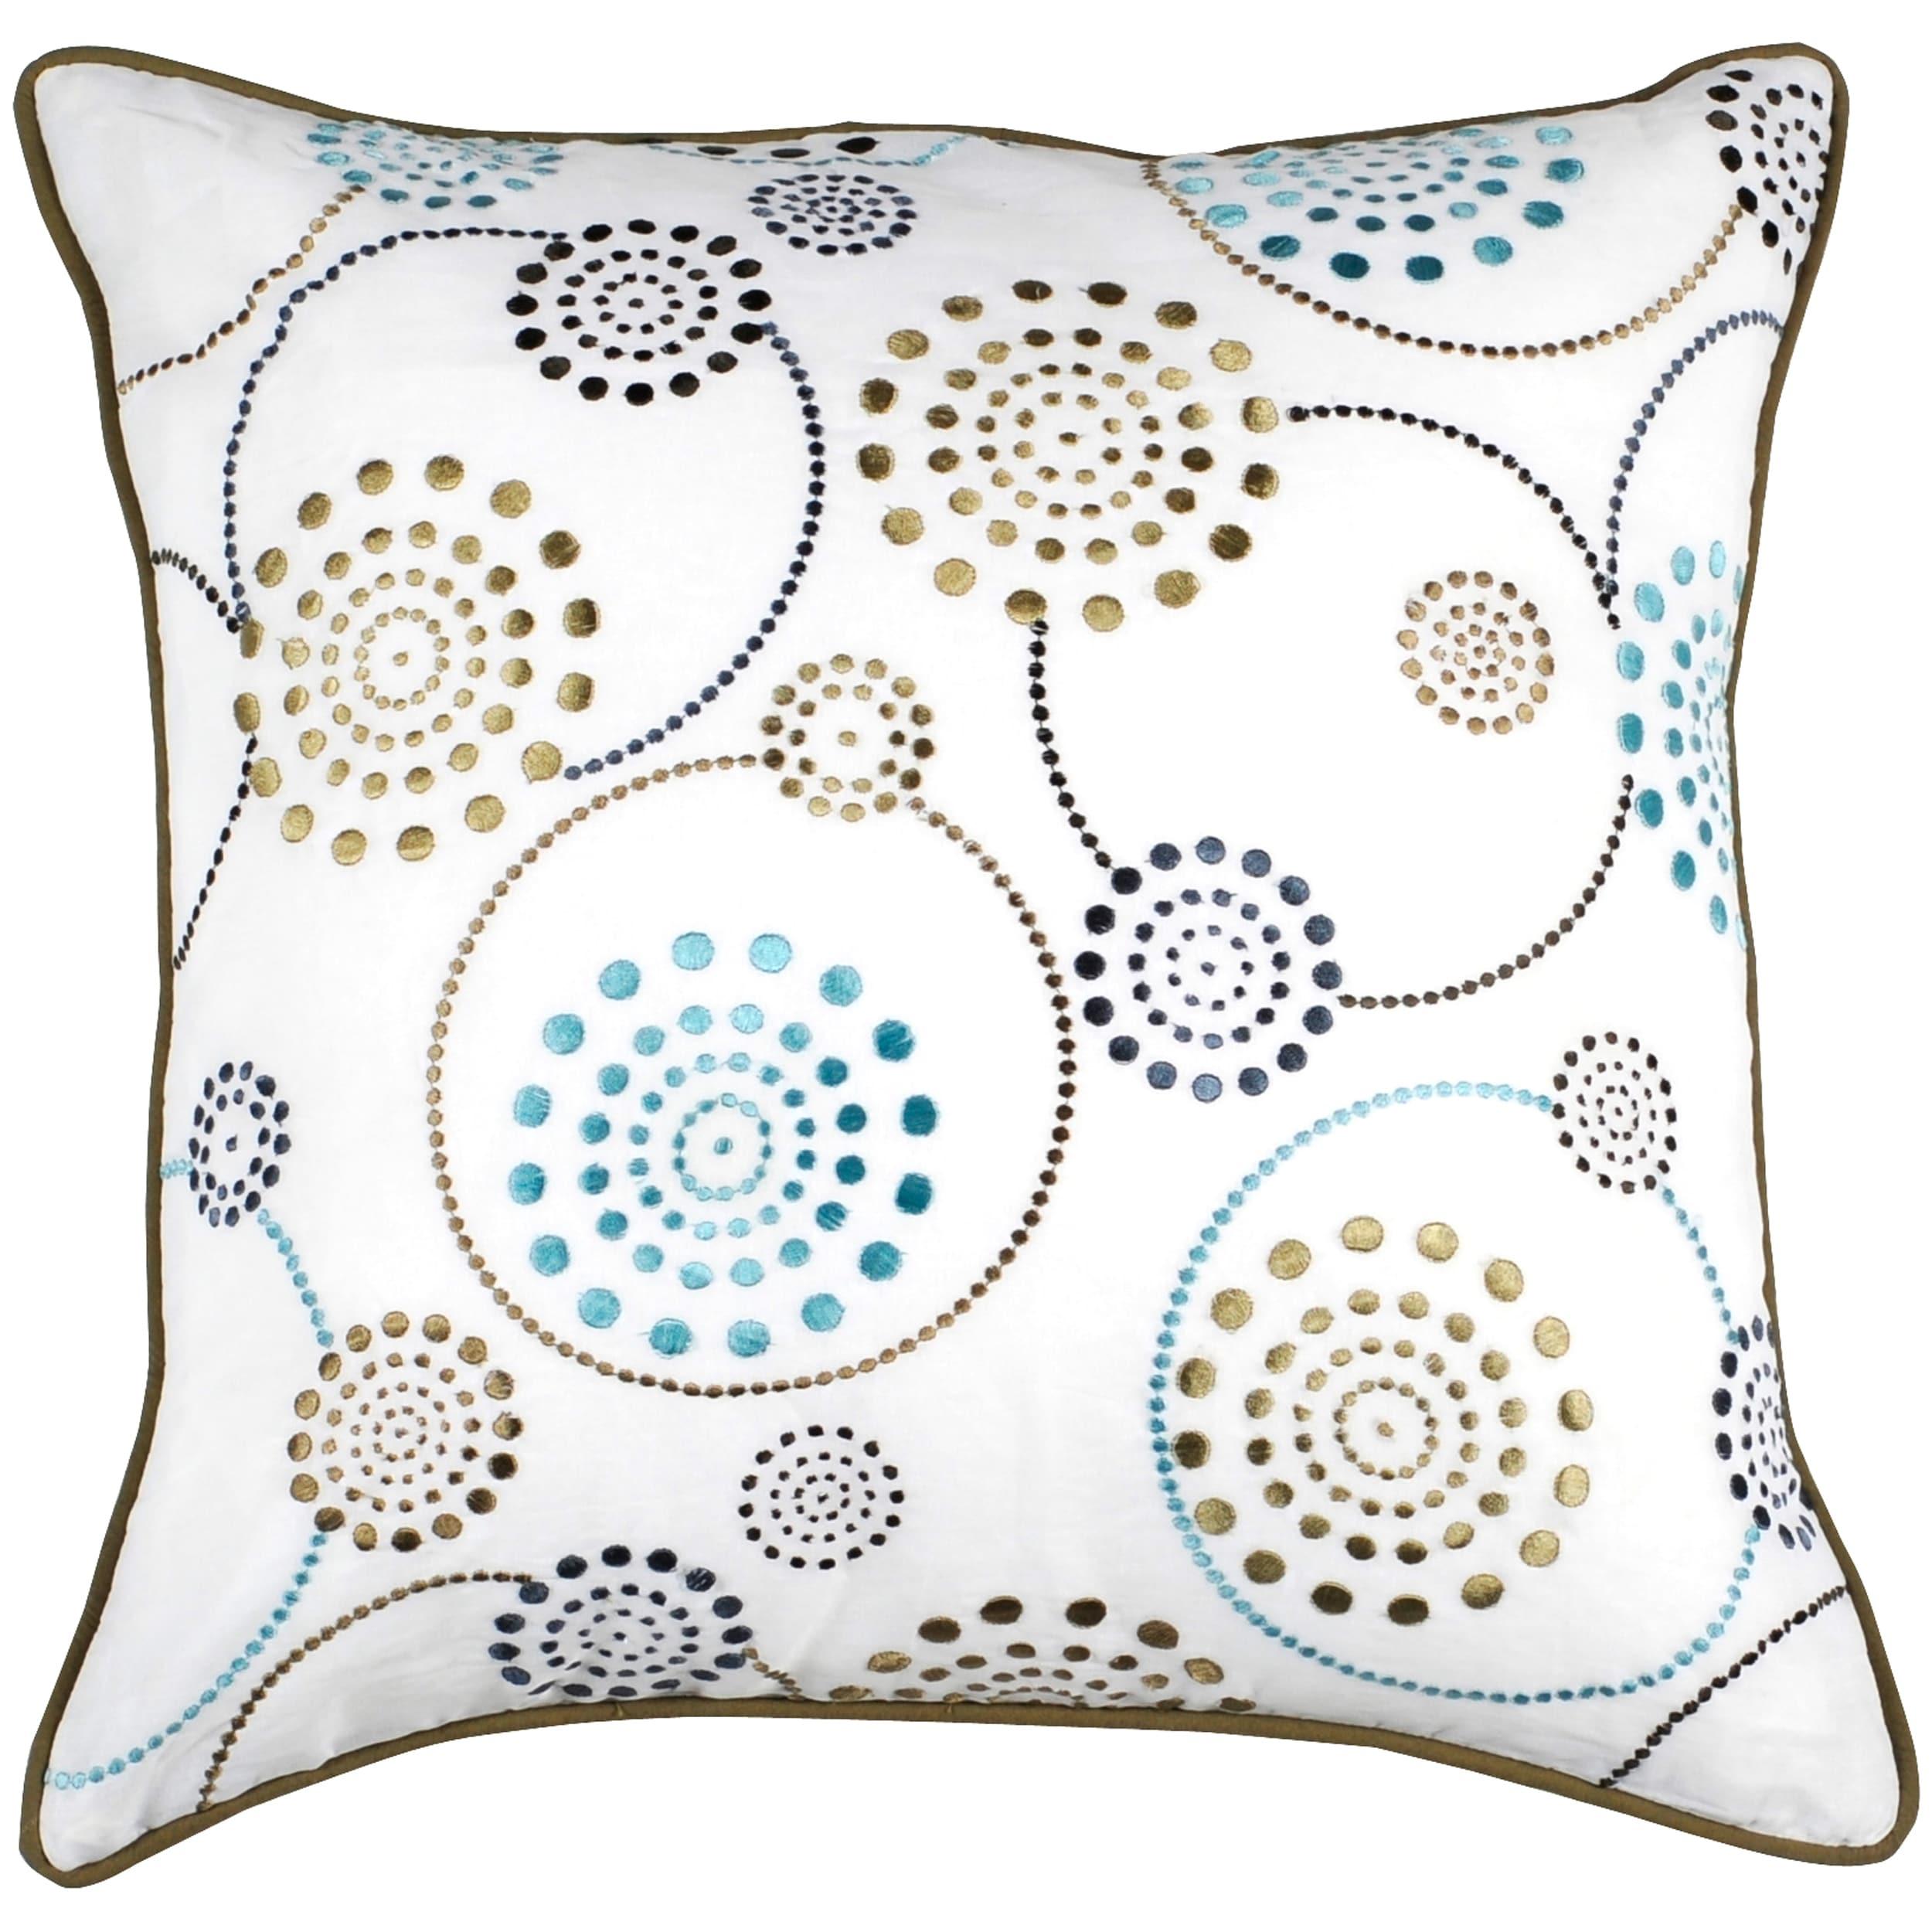 Modern Circles Multicolored Medium Decorative Pillow